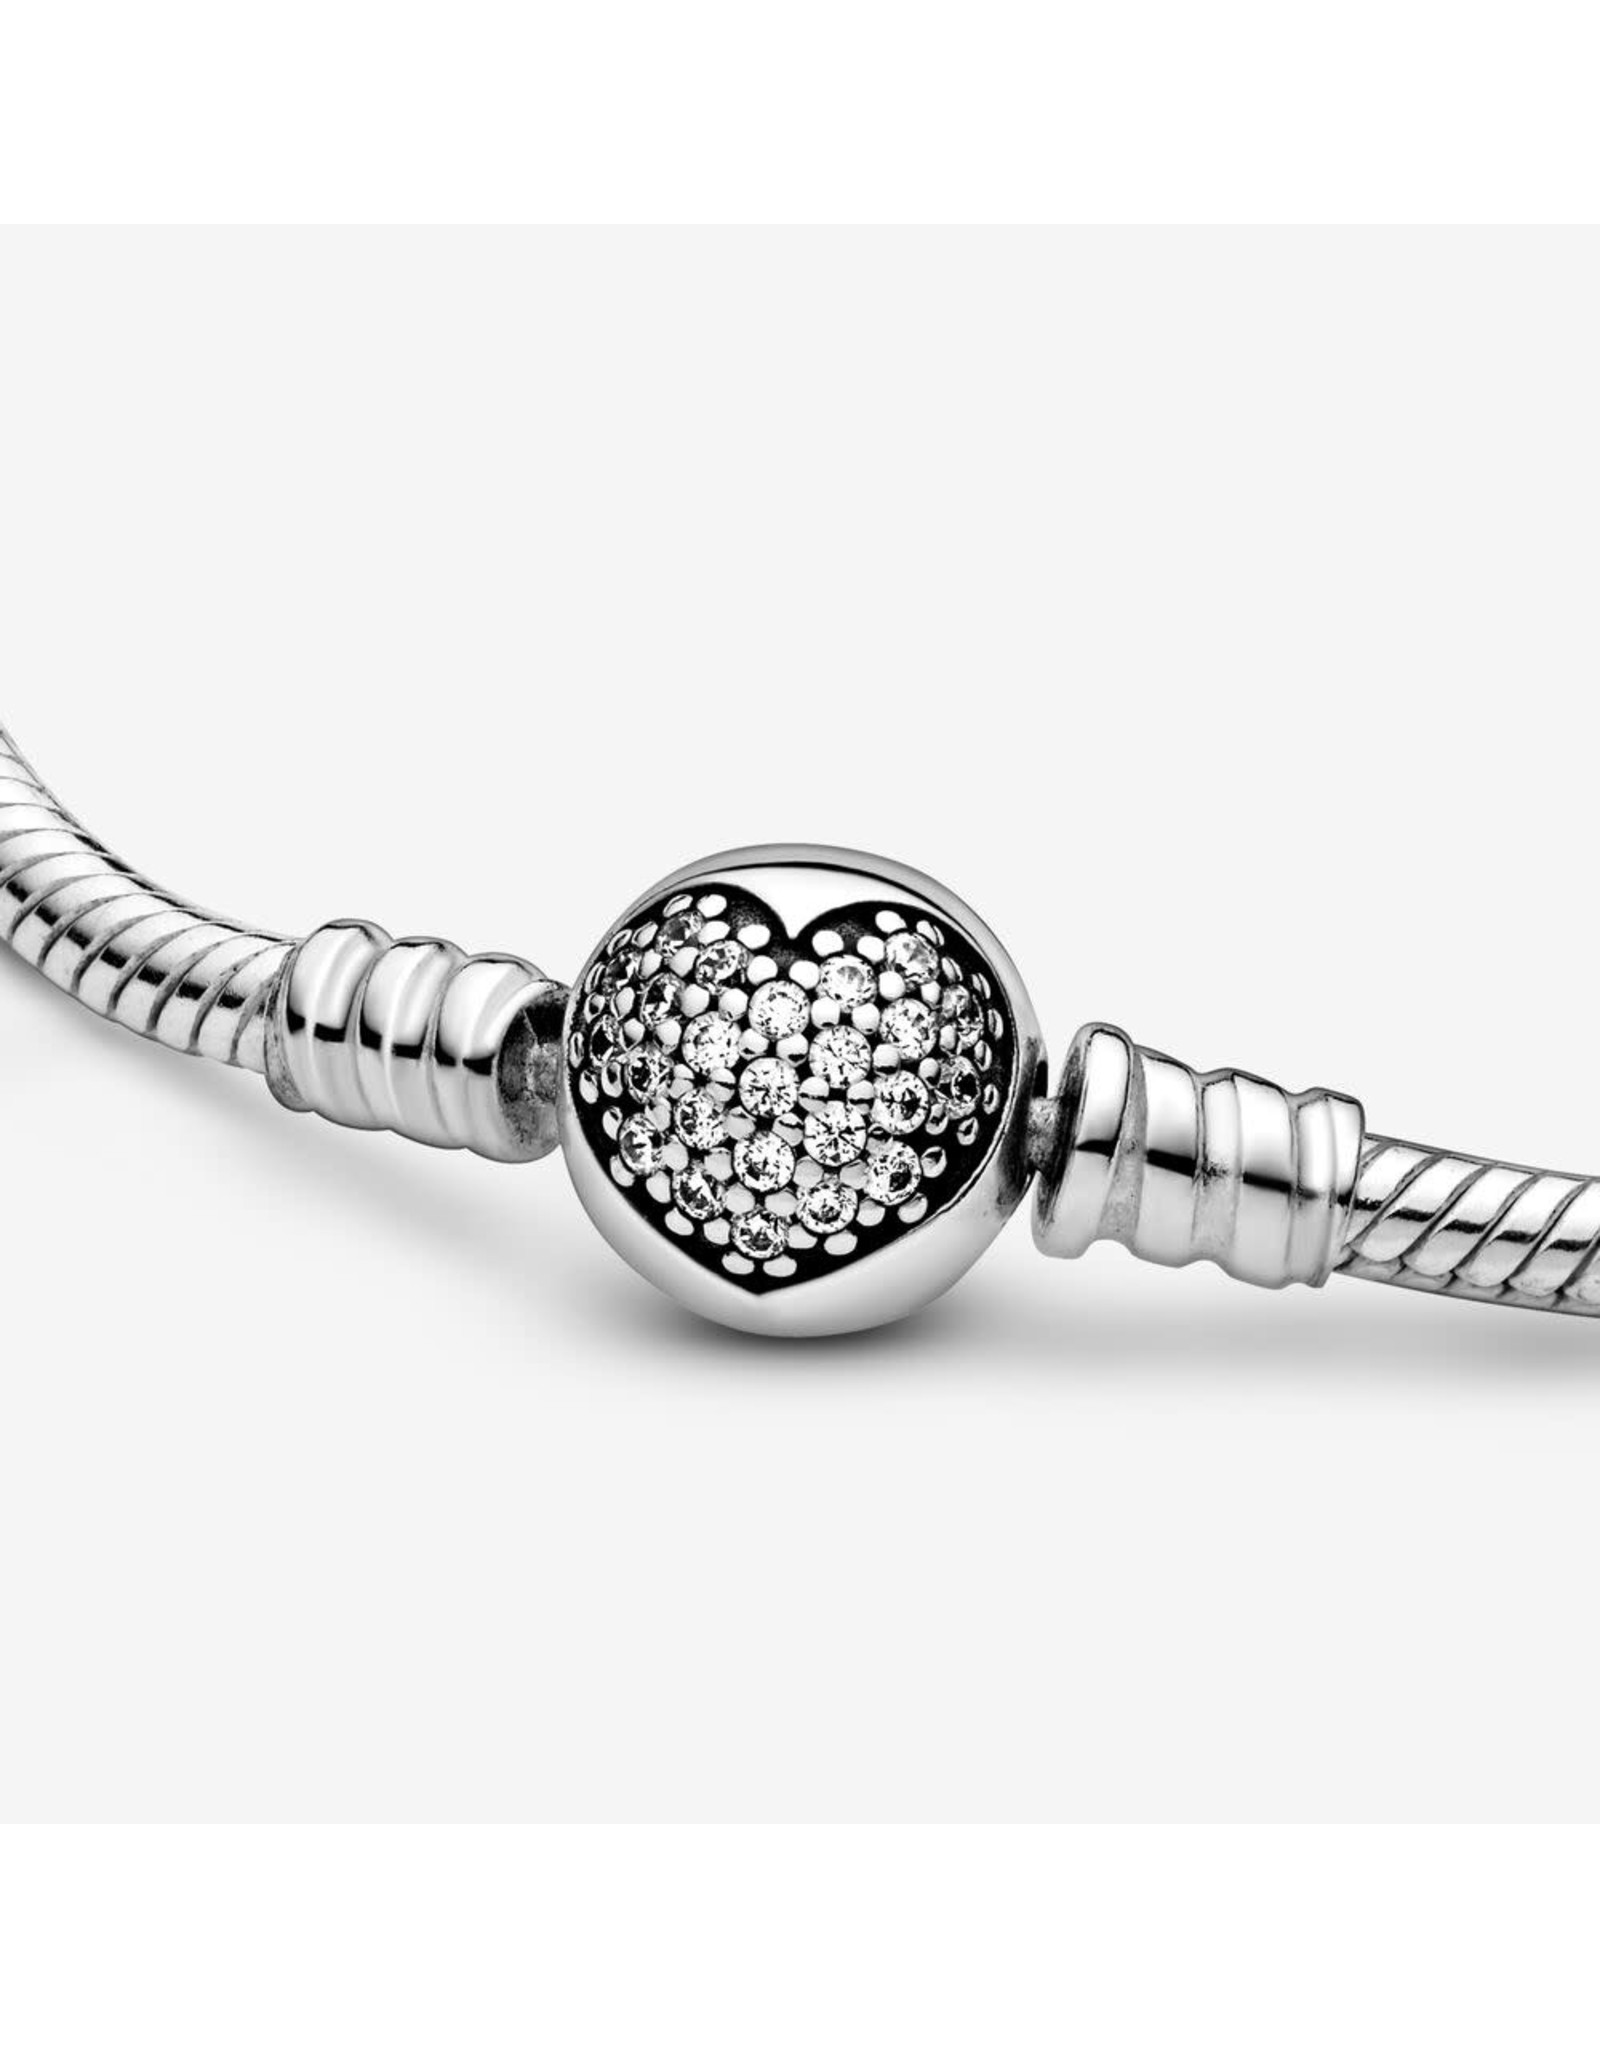 Pandora Pandora Bracelet,590743CZ,  Sparkling Heart Clasp Snake Chain, Sterling Silver CZ